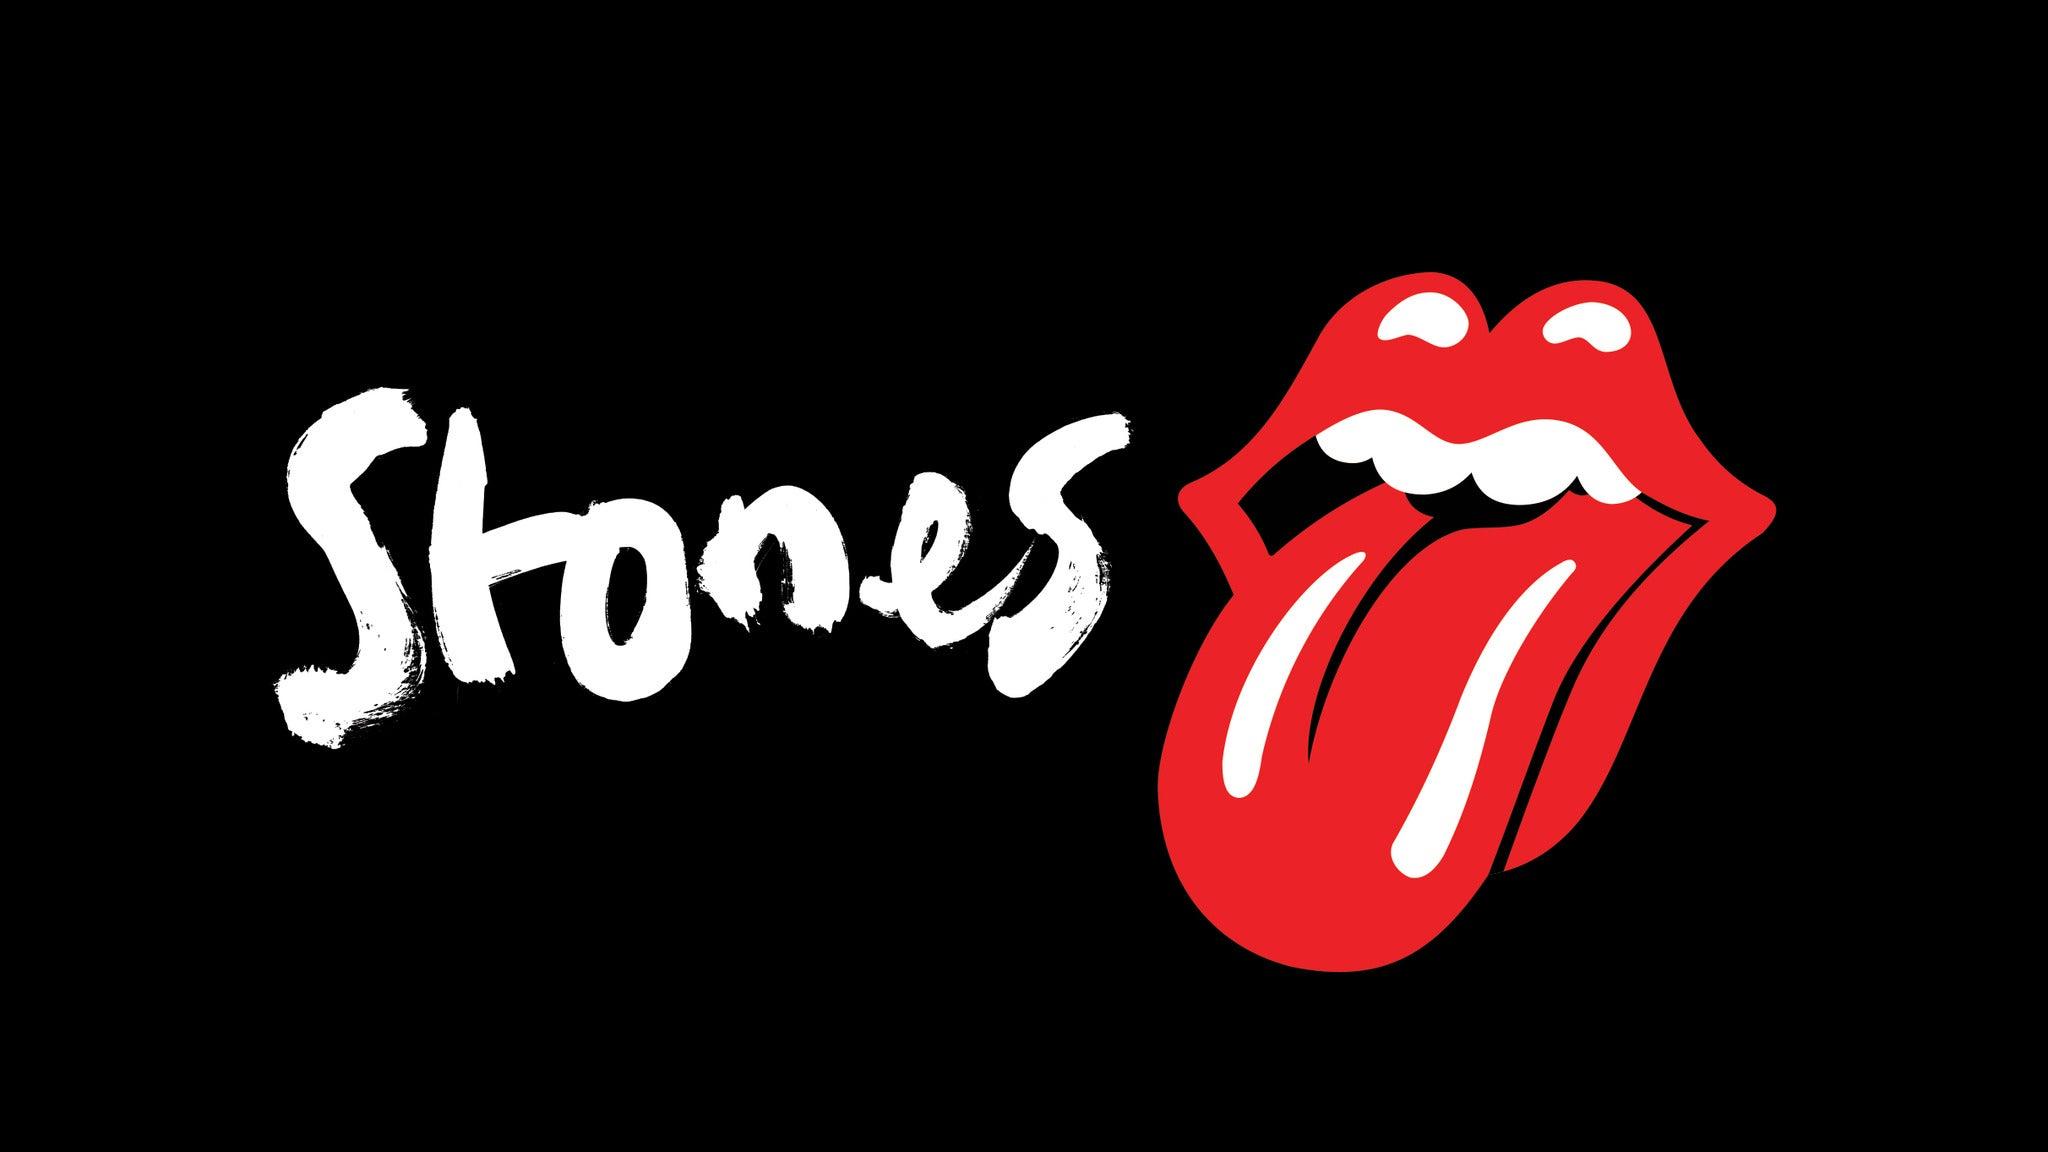 The Rolling Stones - No Filter 2021 presale password